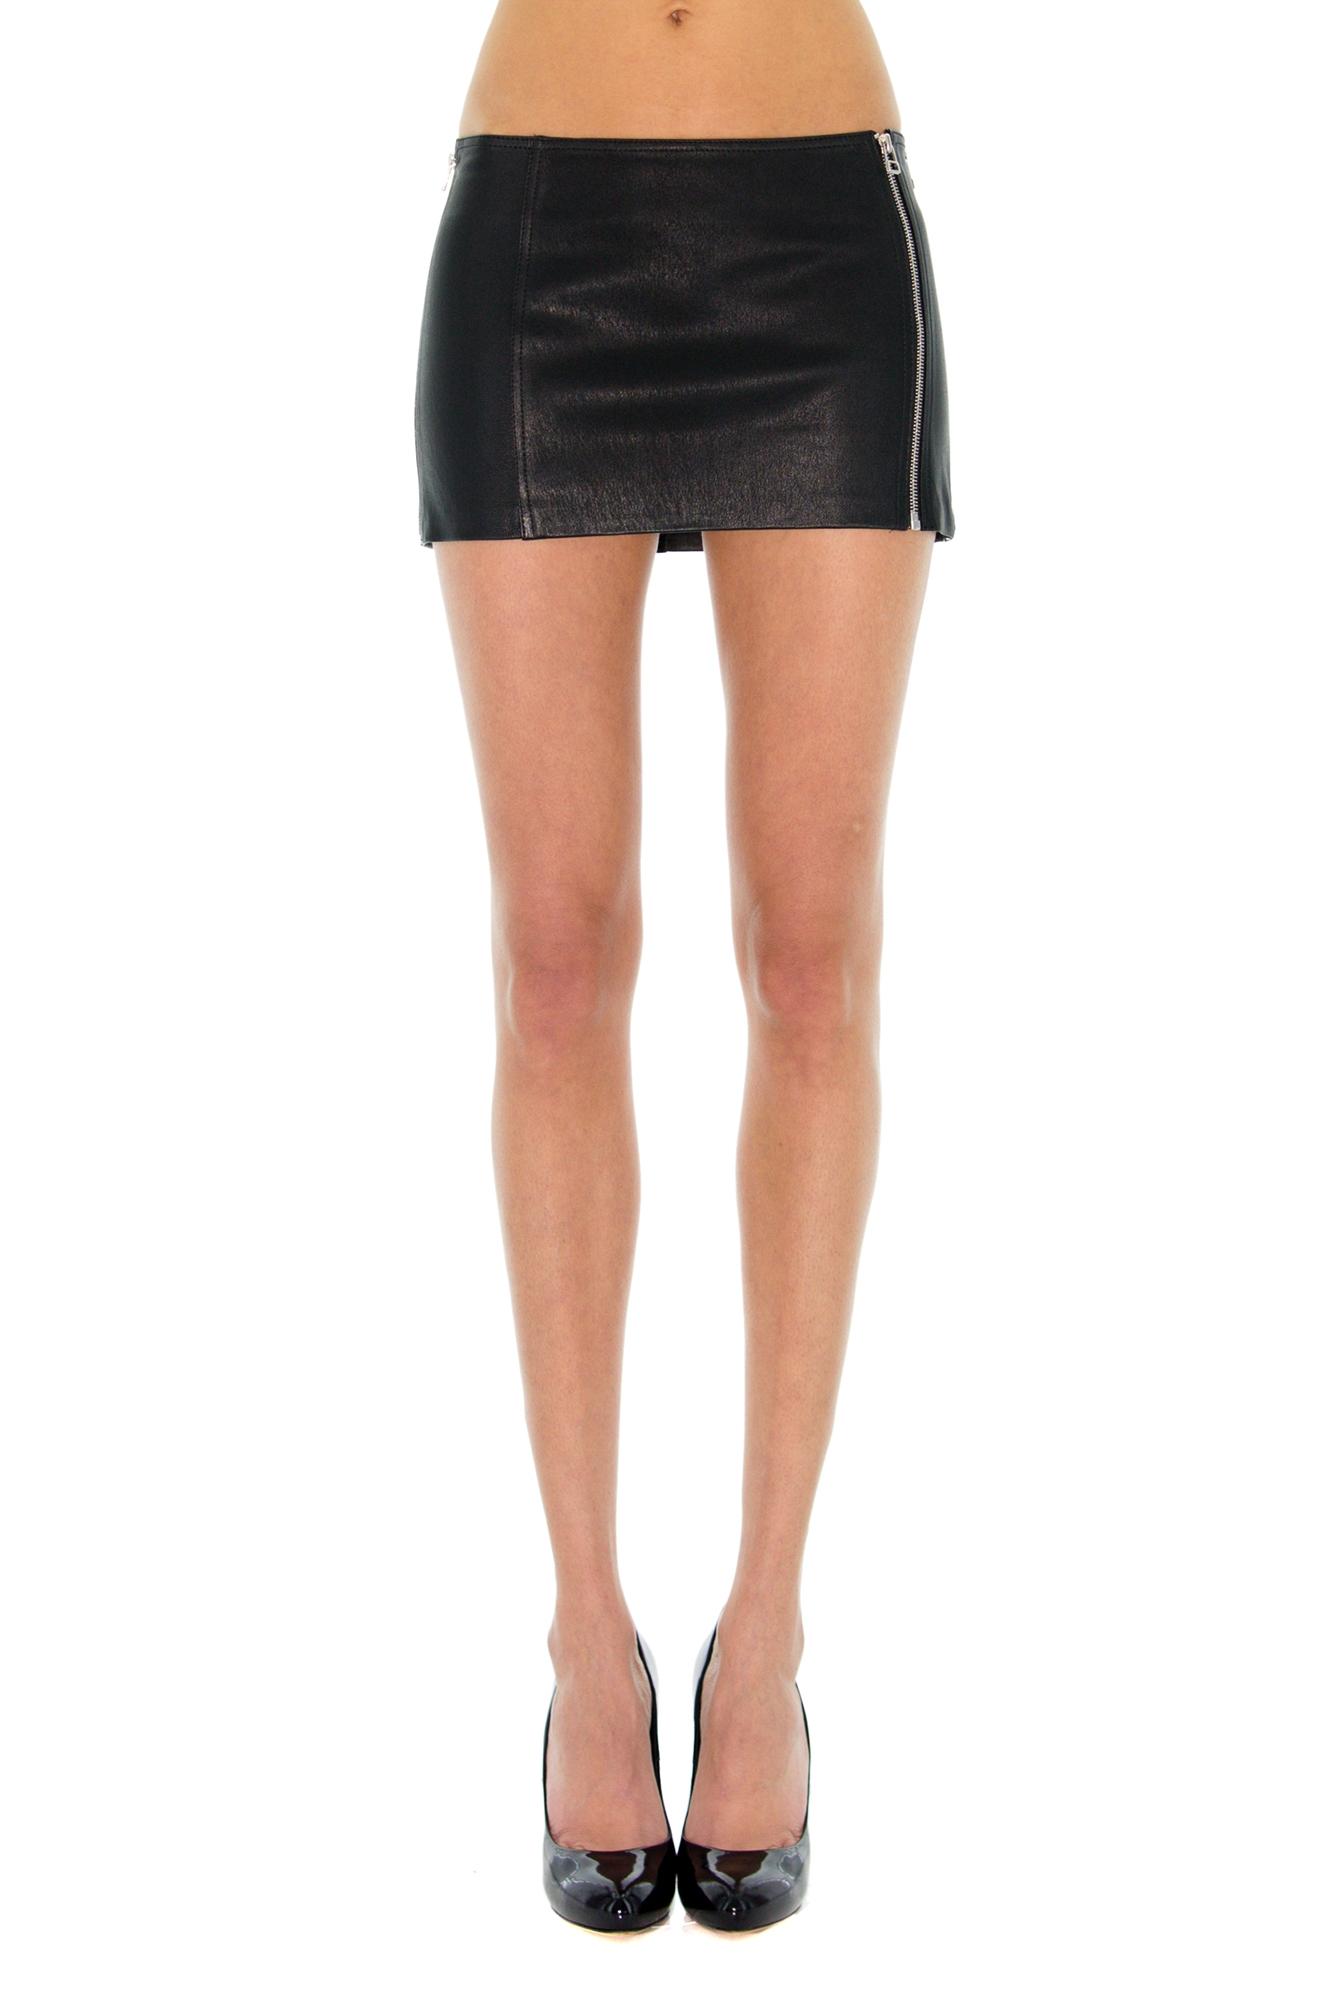 mini jupe en cuir mini cuir stretch katarina katancevic stefanie renoma. Black Bedroom Furniture Sets. Home Design Ideas